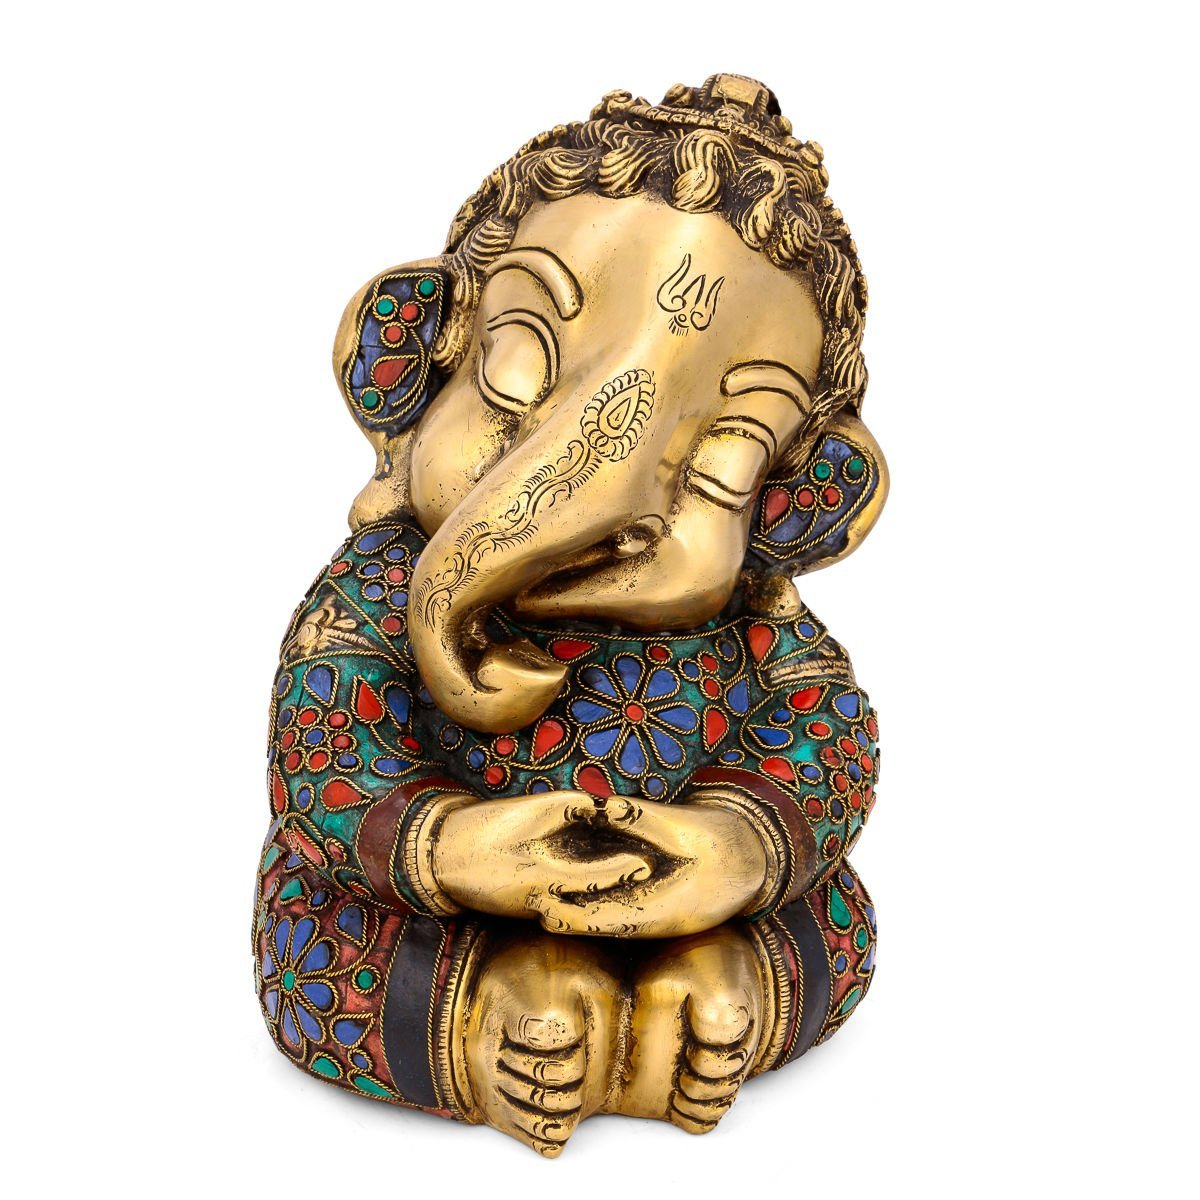 Collectible India Brass Baby Ganesh Idol Hindu Success Lord